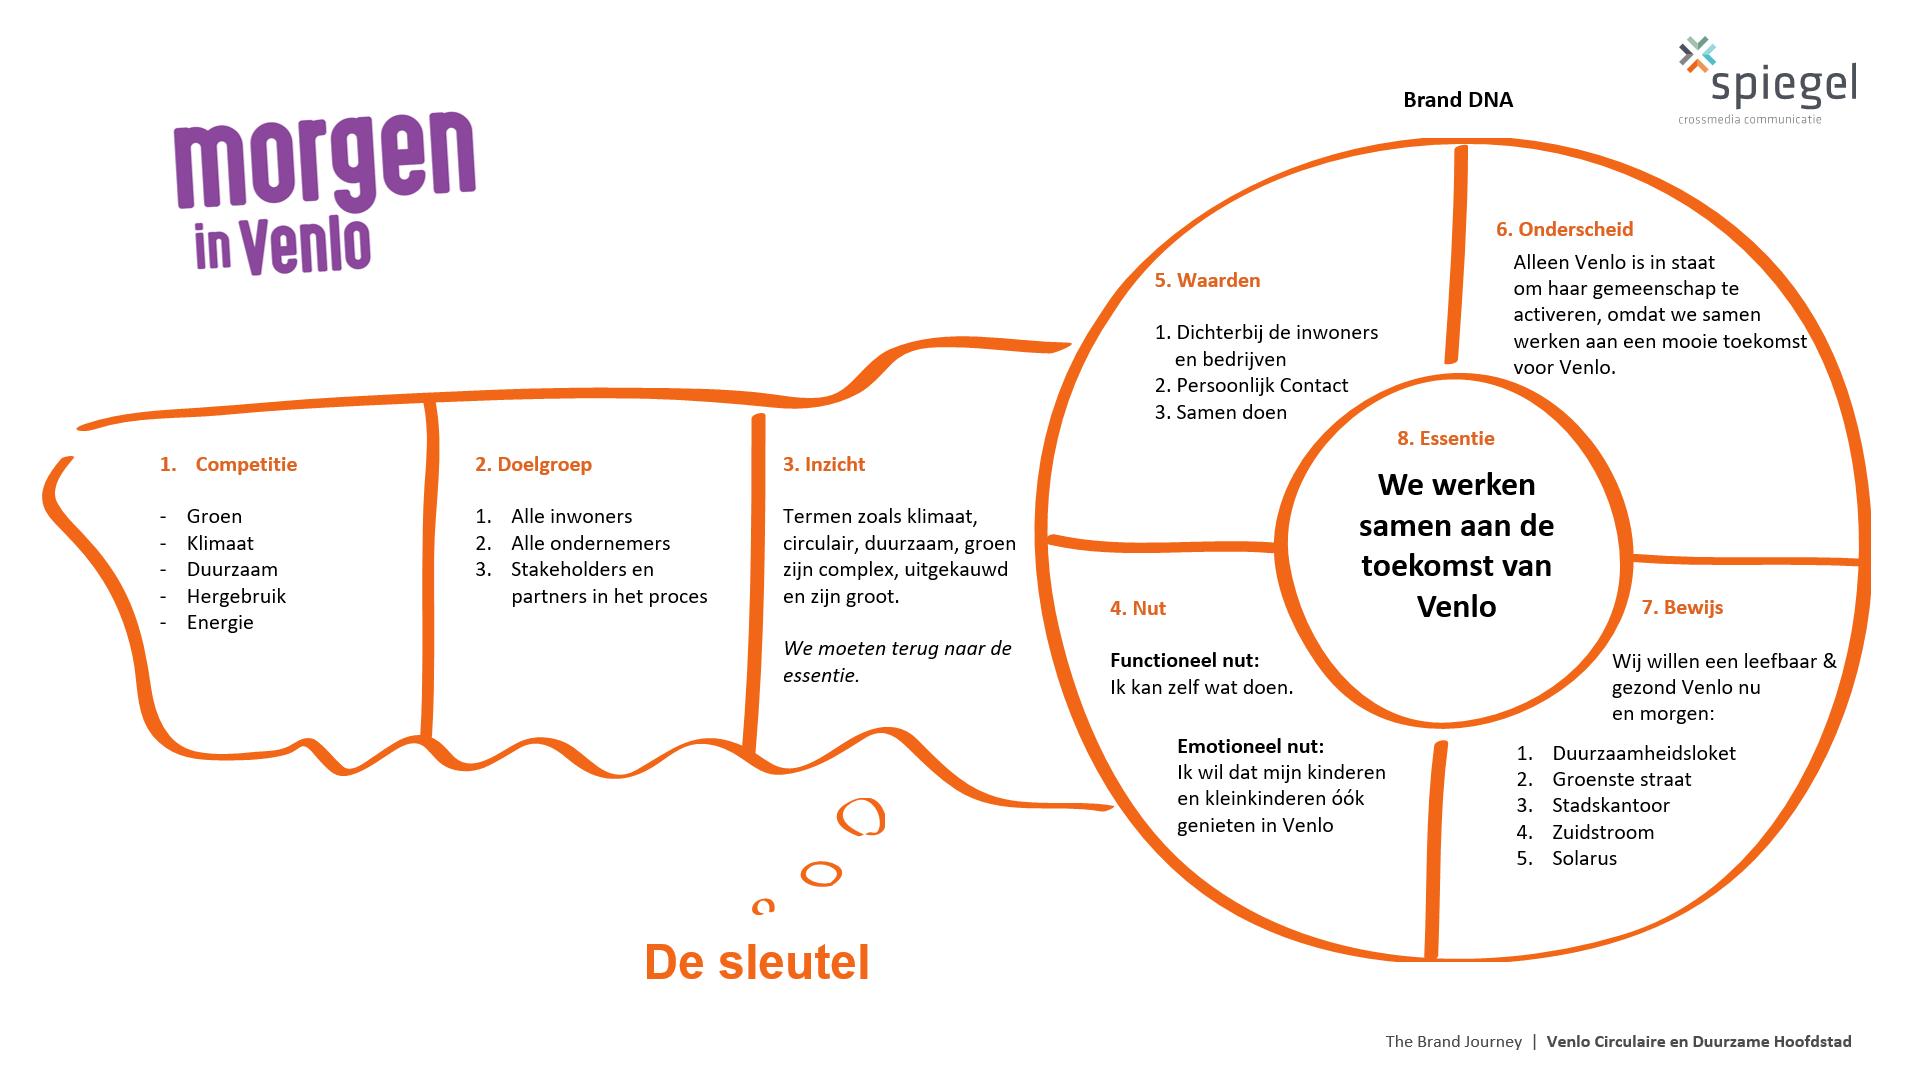 Brandkey-Gemeente-Venlo-Spiegel-crossmedia-communicatie